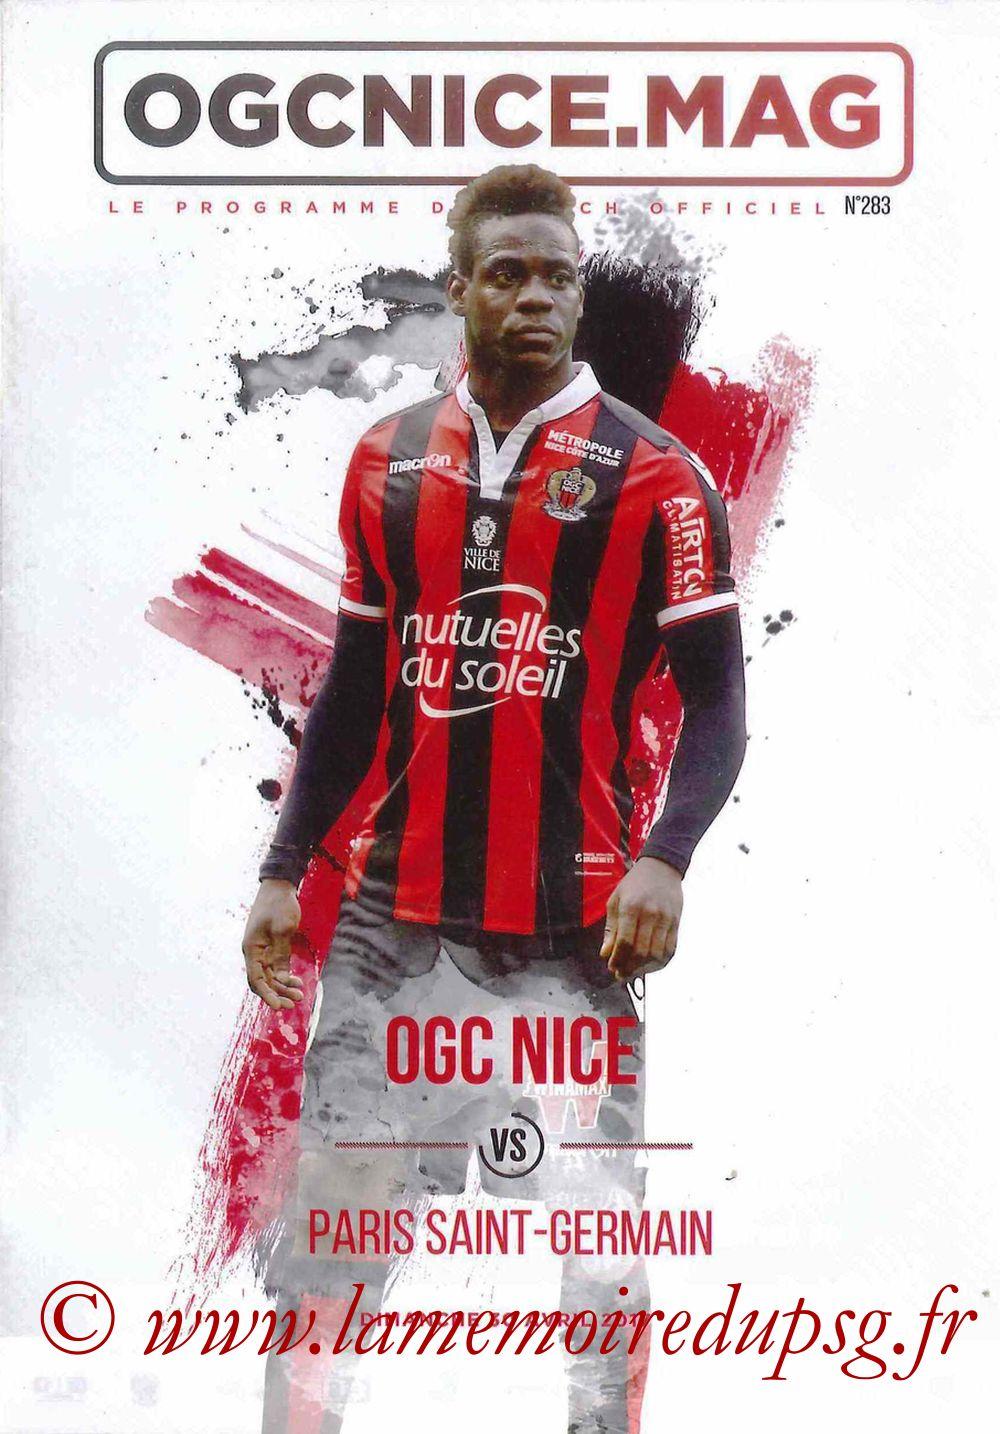 2017-04-30  Nice-PSG (35ème L1, OGC Nice Mag N°283)